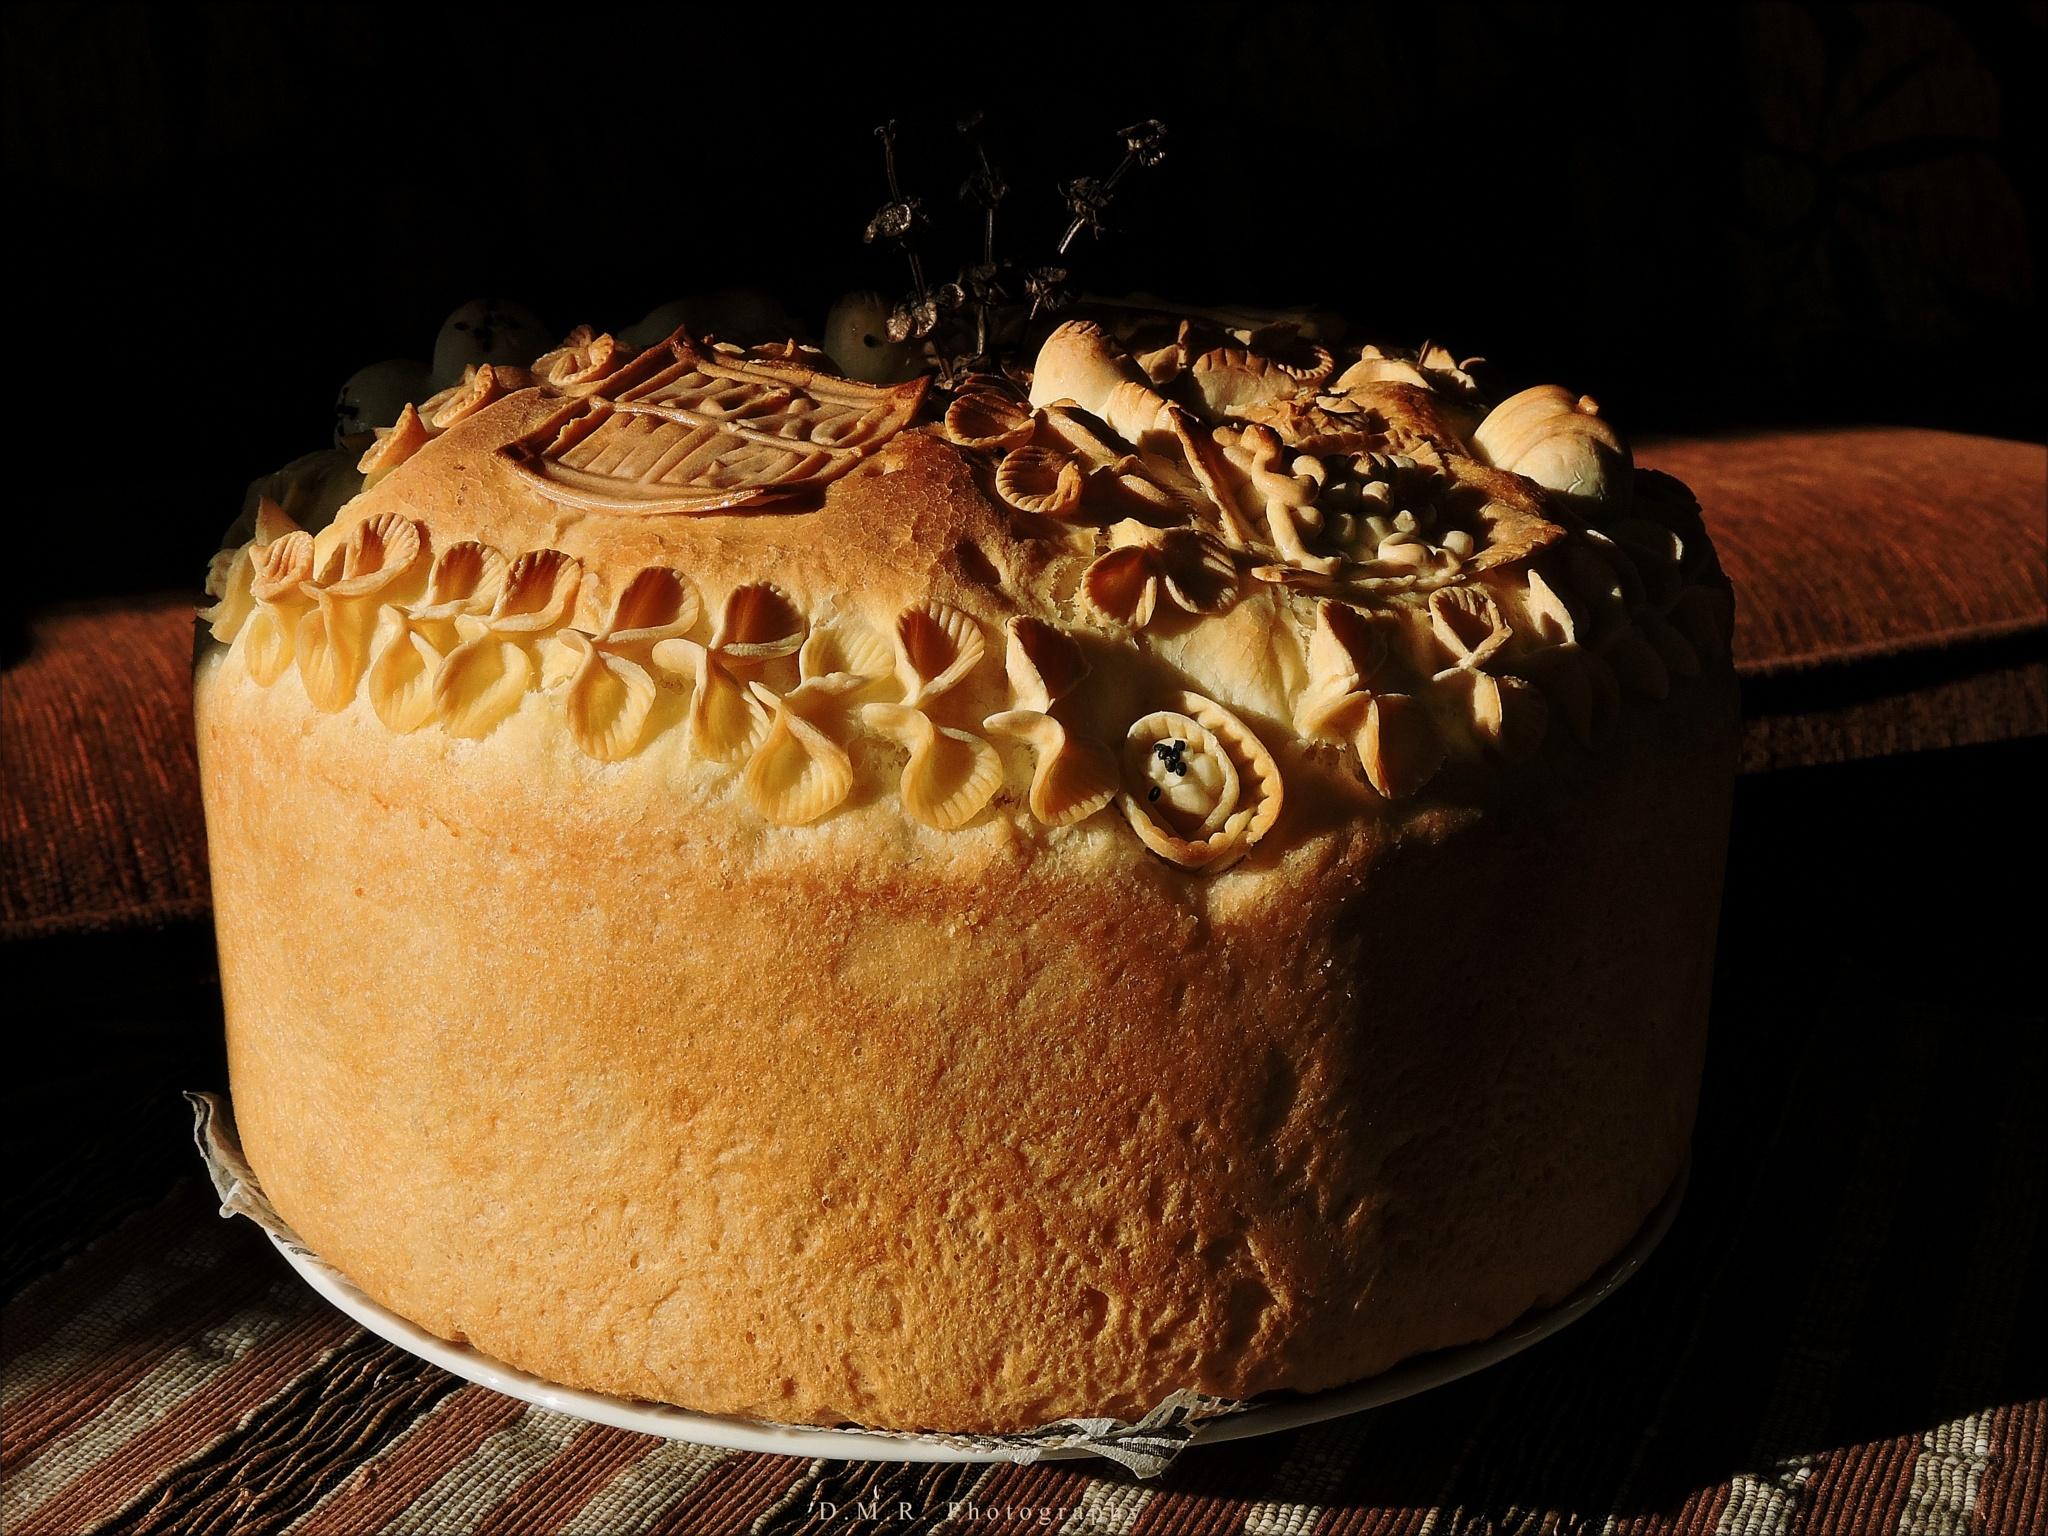 Slava cake for St Nicholas by Драгана М. Реџић